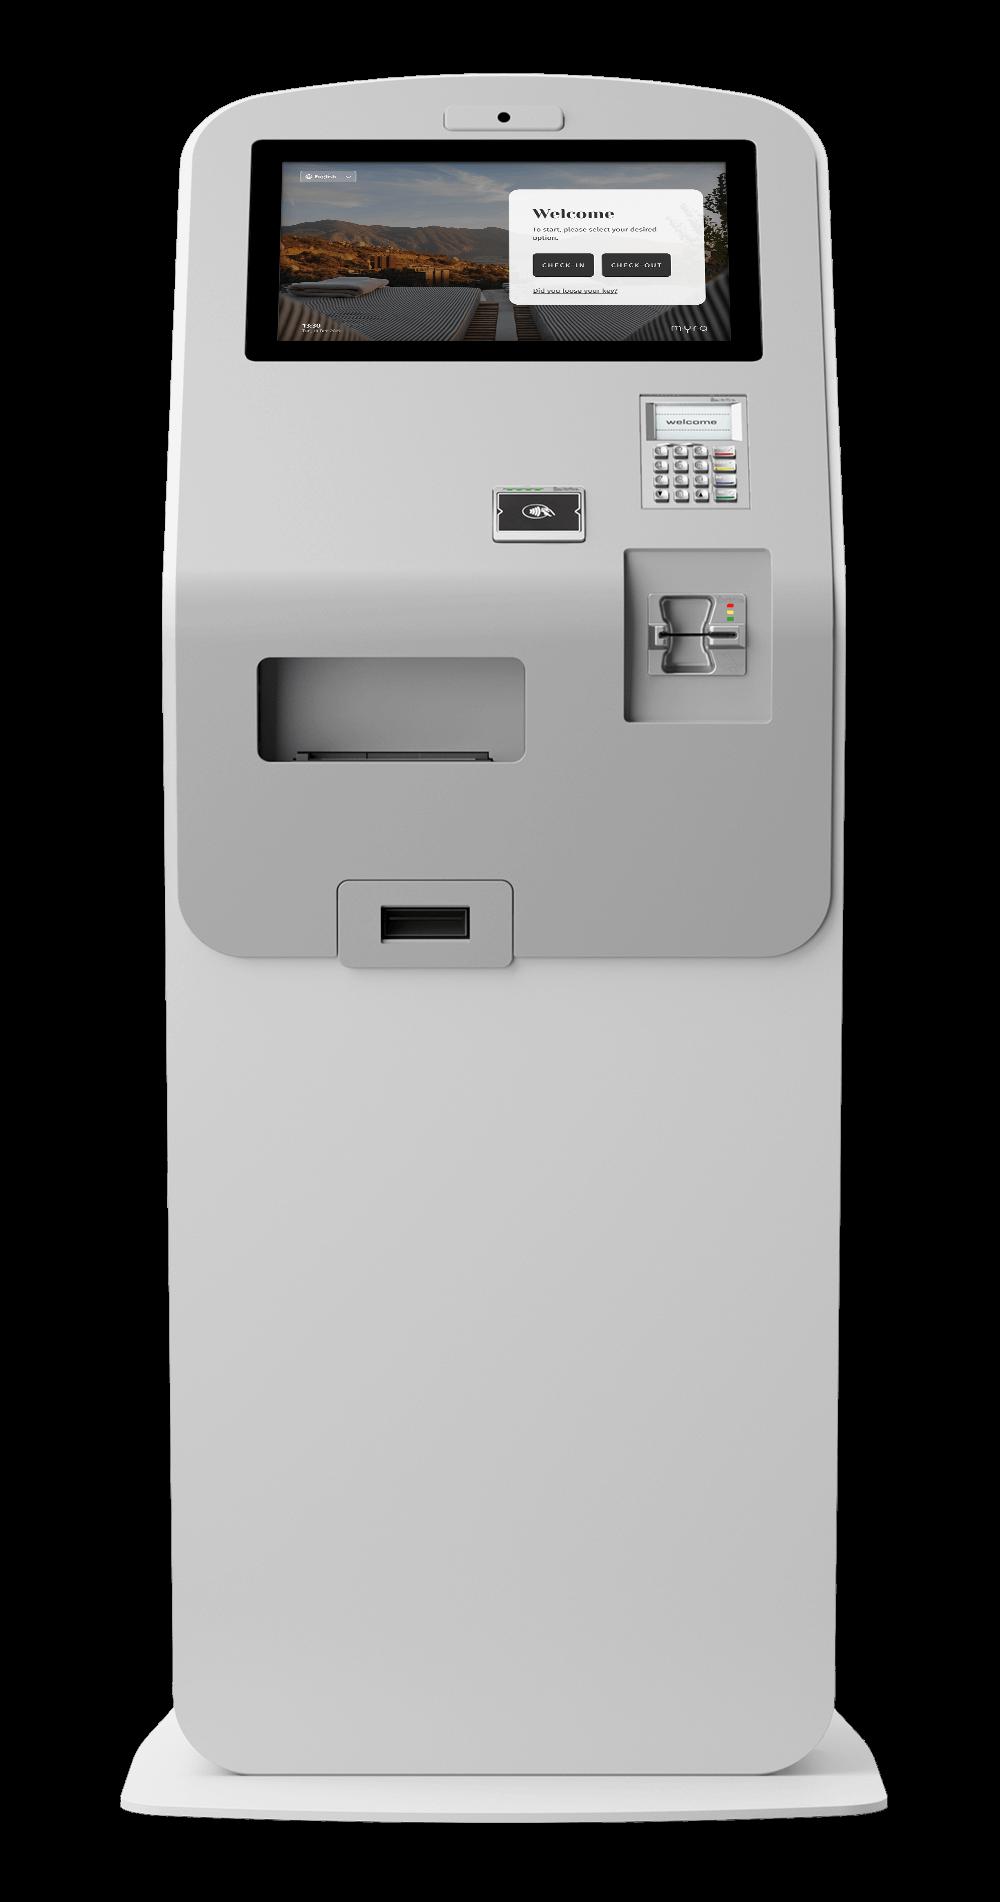 myra-check-in-kiosk-frontal-white